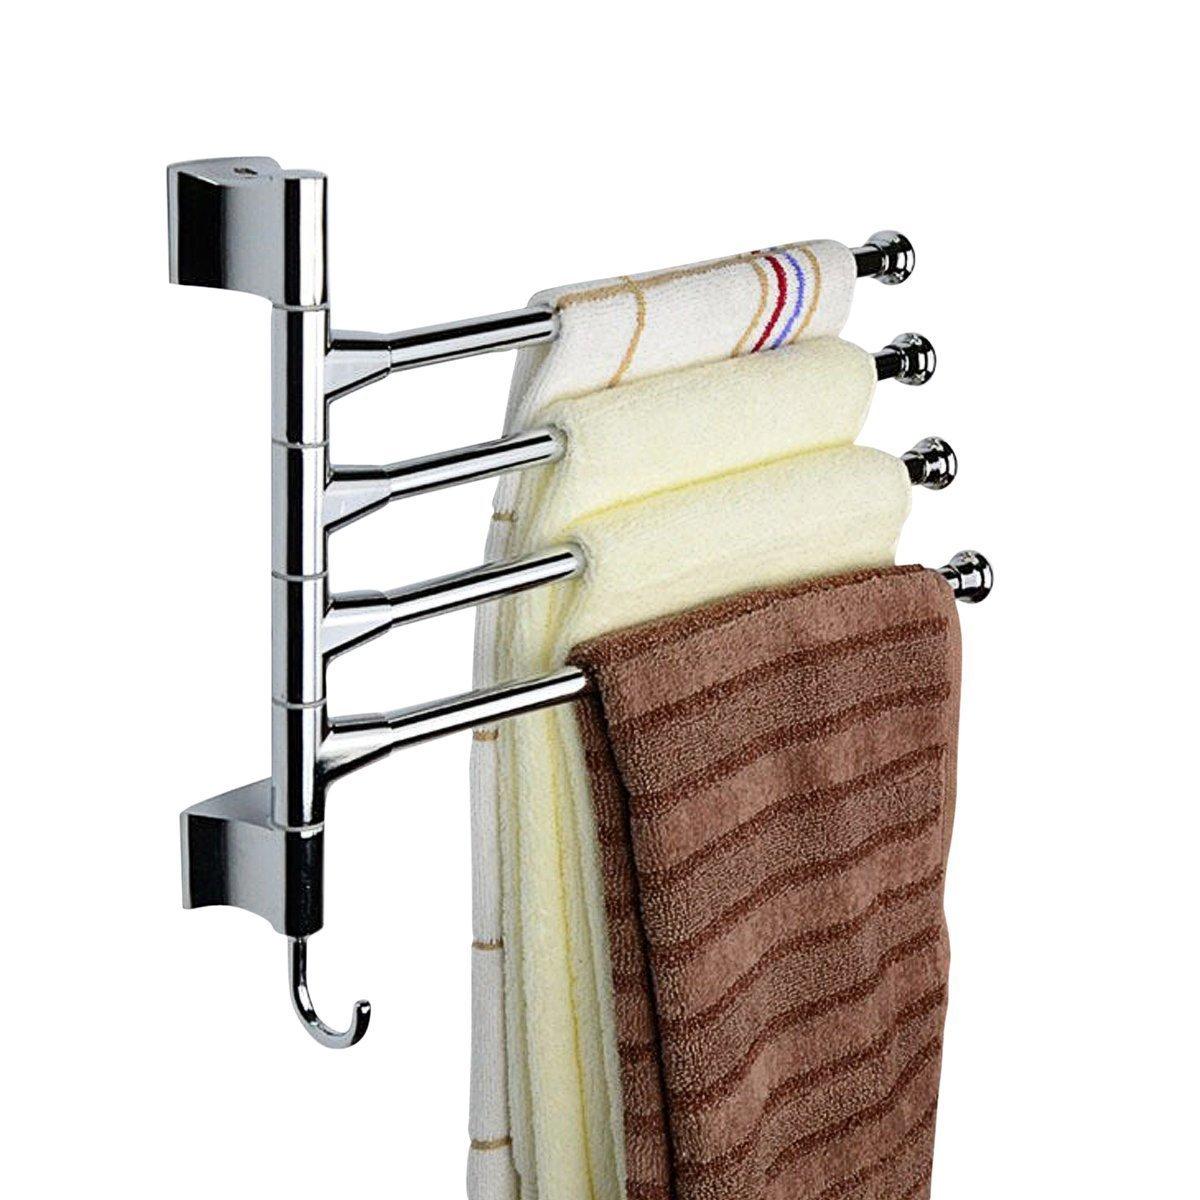 Rack swinging towel